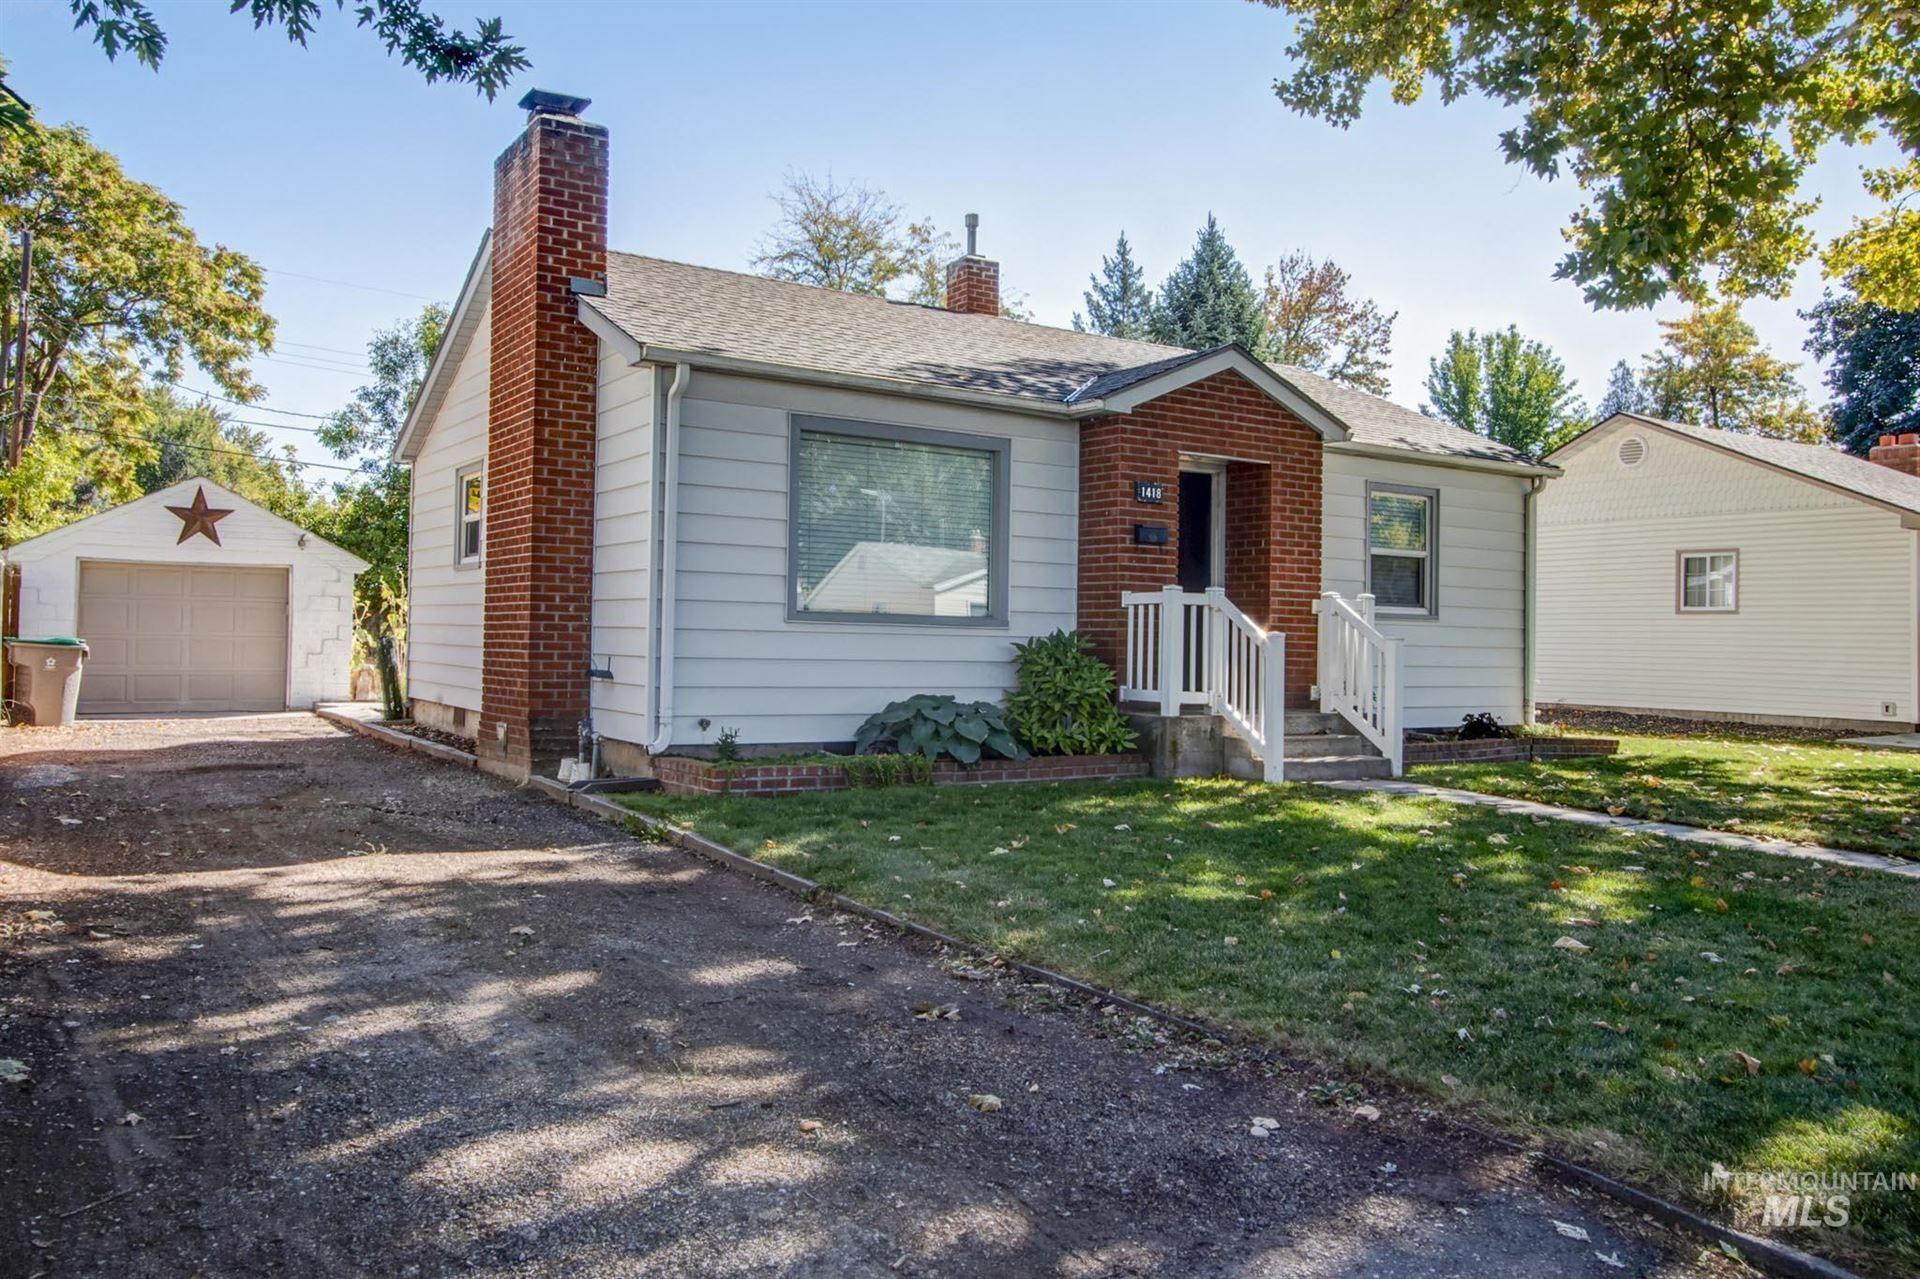 1418 S Rand Street, Boise, ID 83709 - MLS#: 98821121